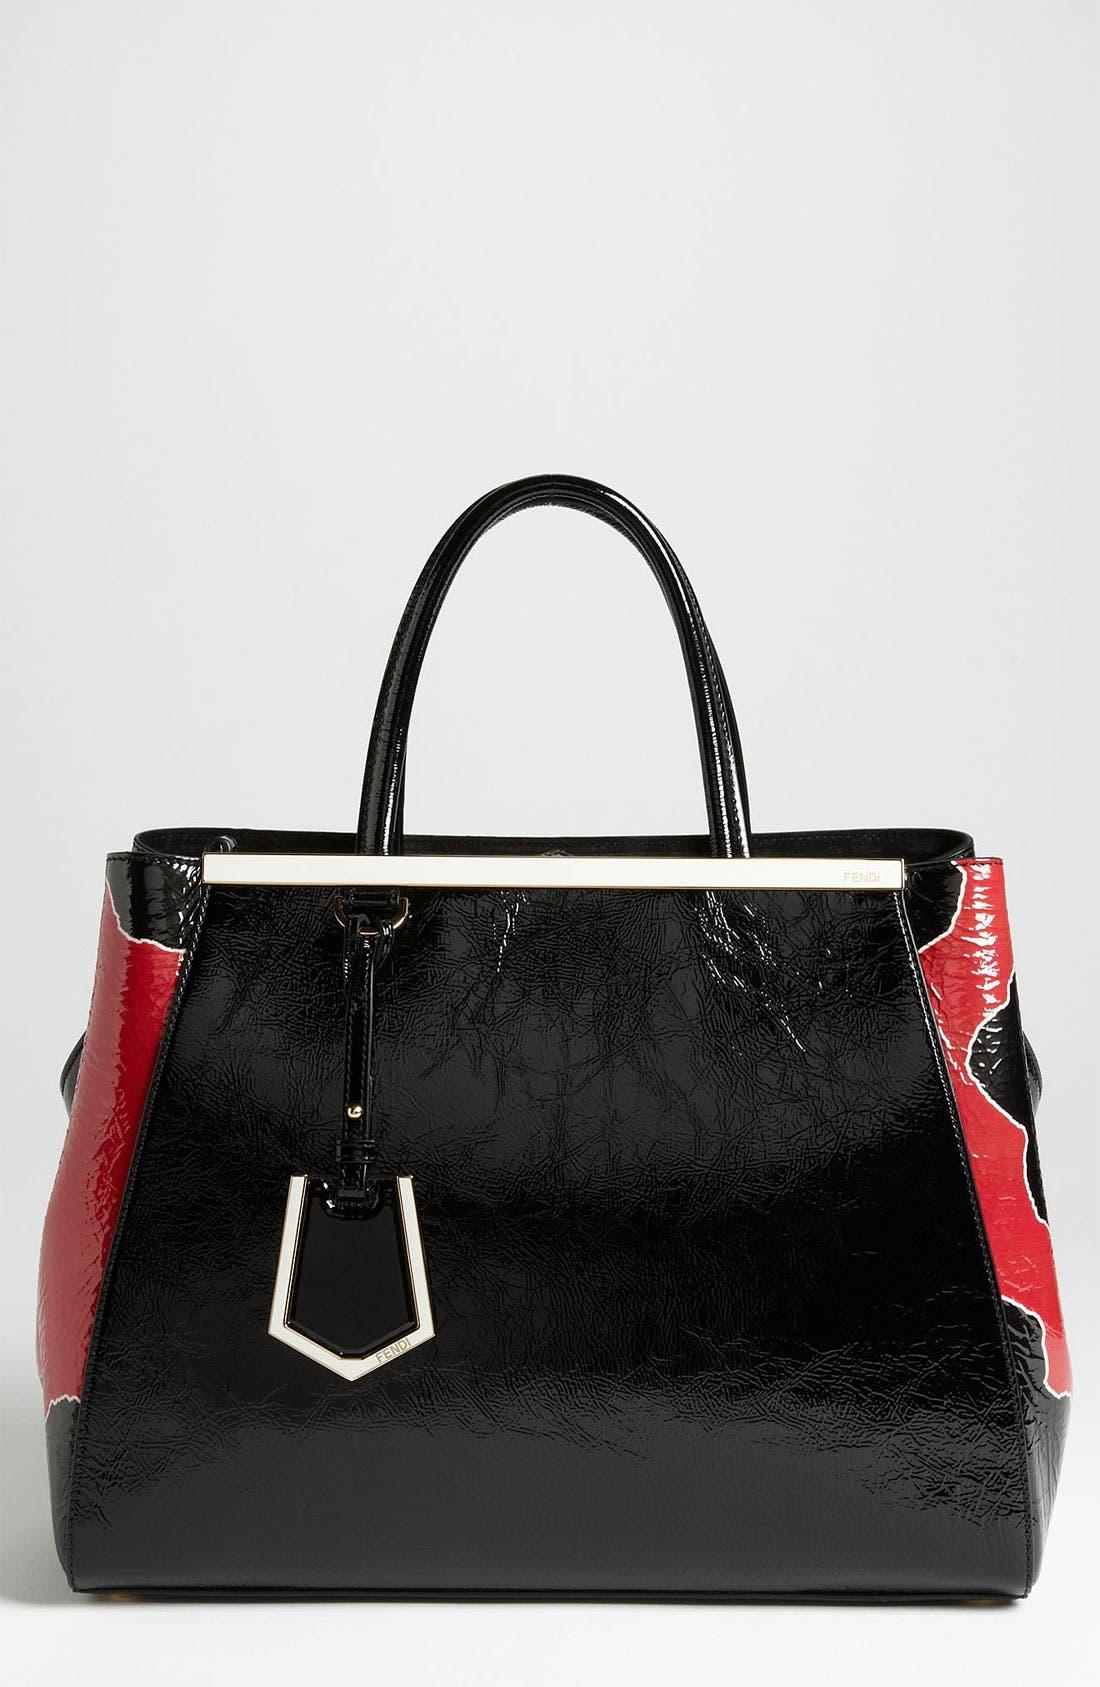 Alternate Image 1 Selected - Fendi '2Jours - Medium' Patent Leather Shopper